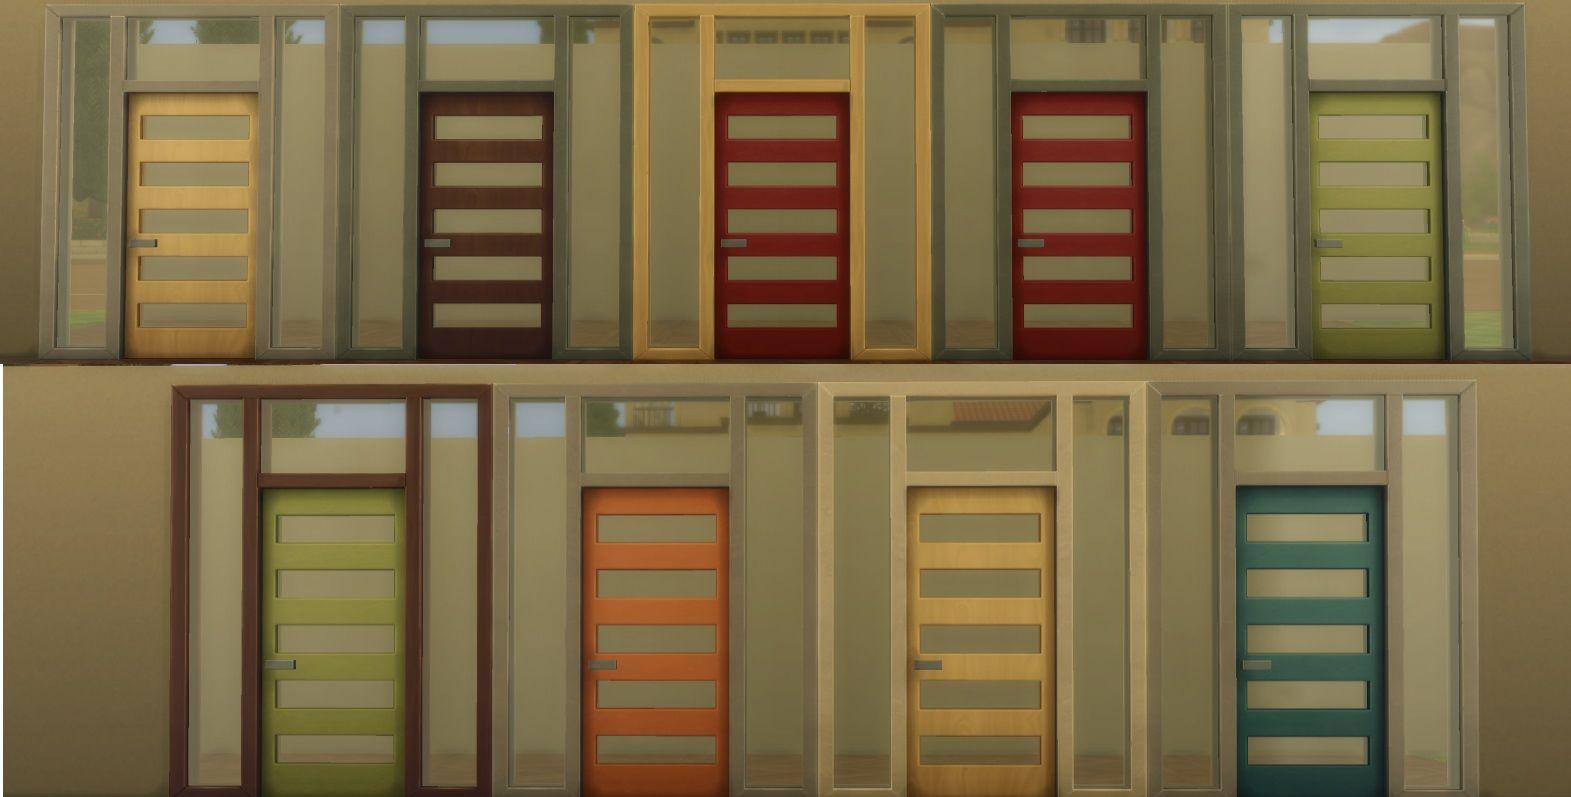 Mod The Sims Sims 4 Doors Modified Geek Pinterest Sims